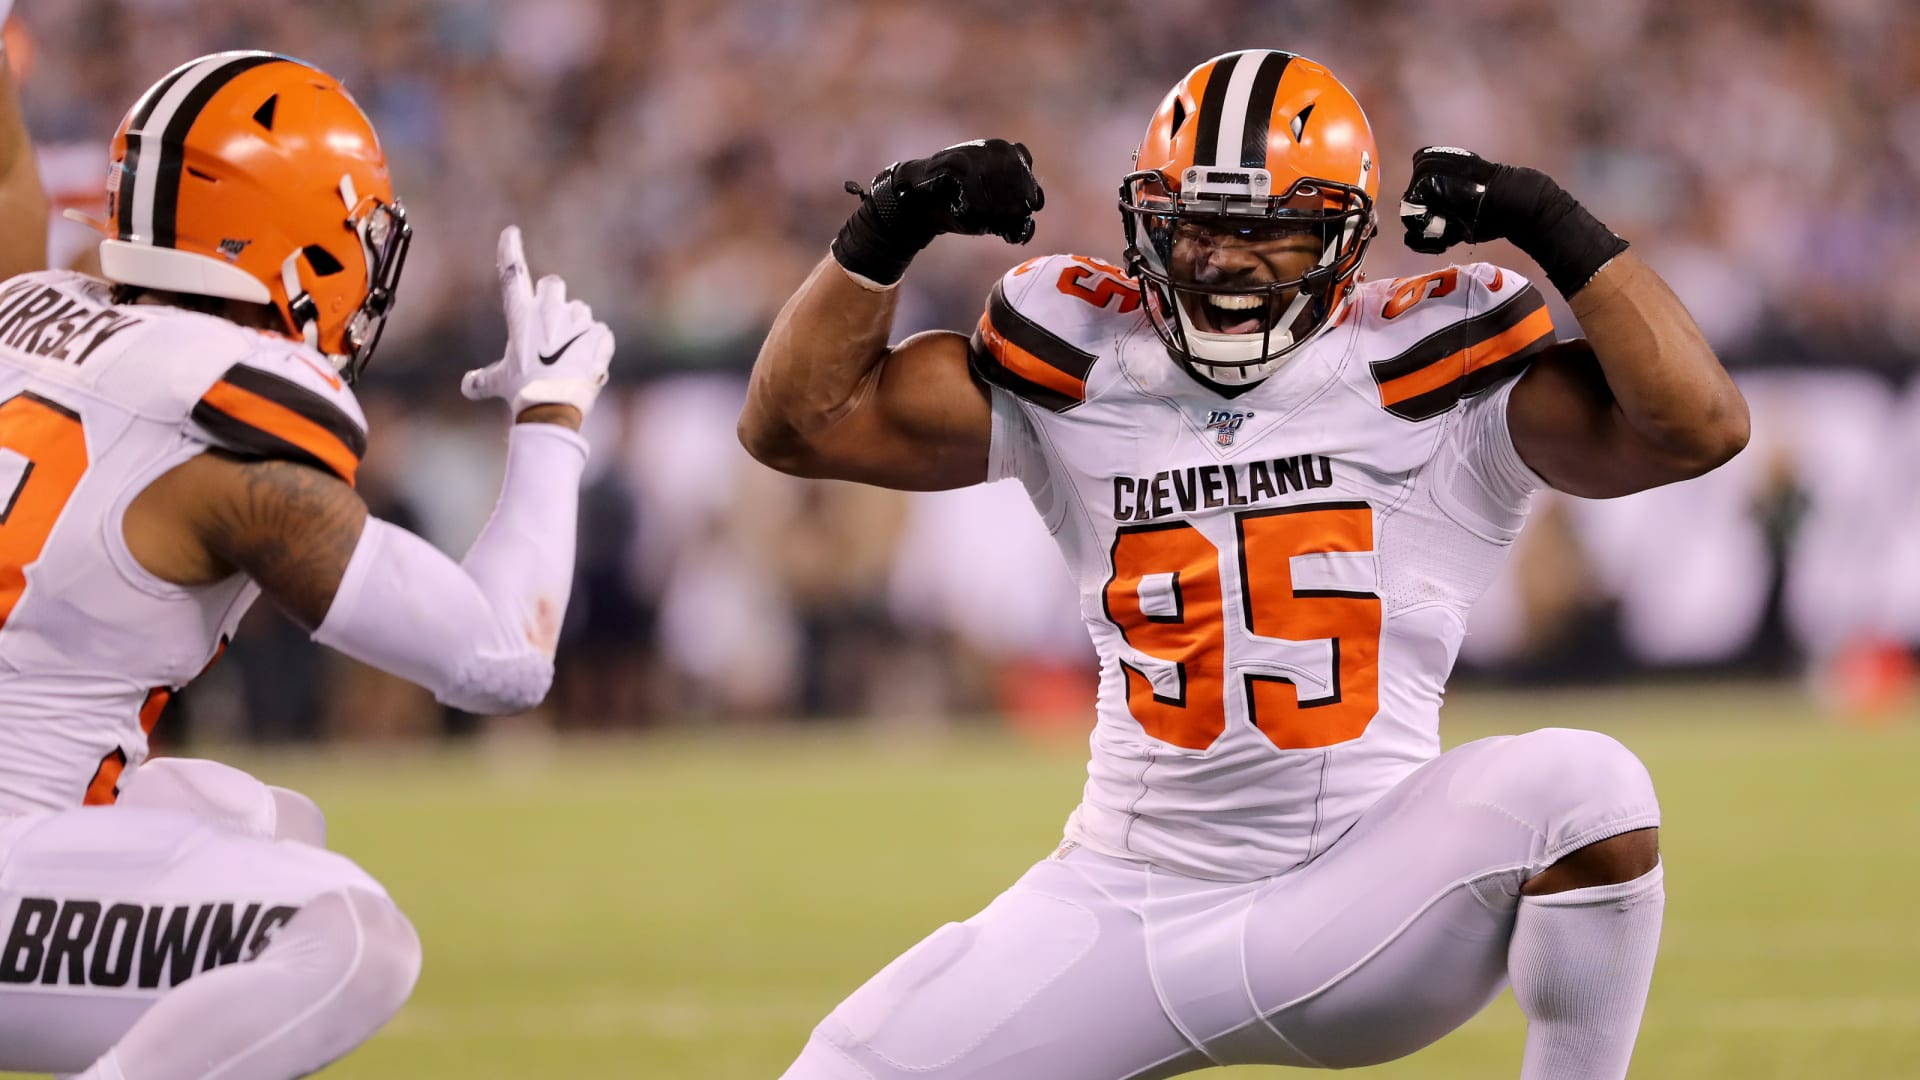 Cleveland Browns: Top 5 games of Myles Garrett's career so far